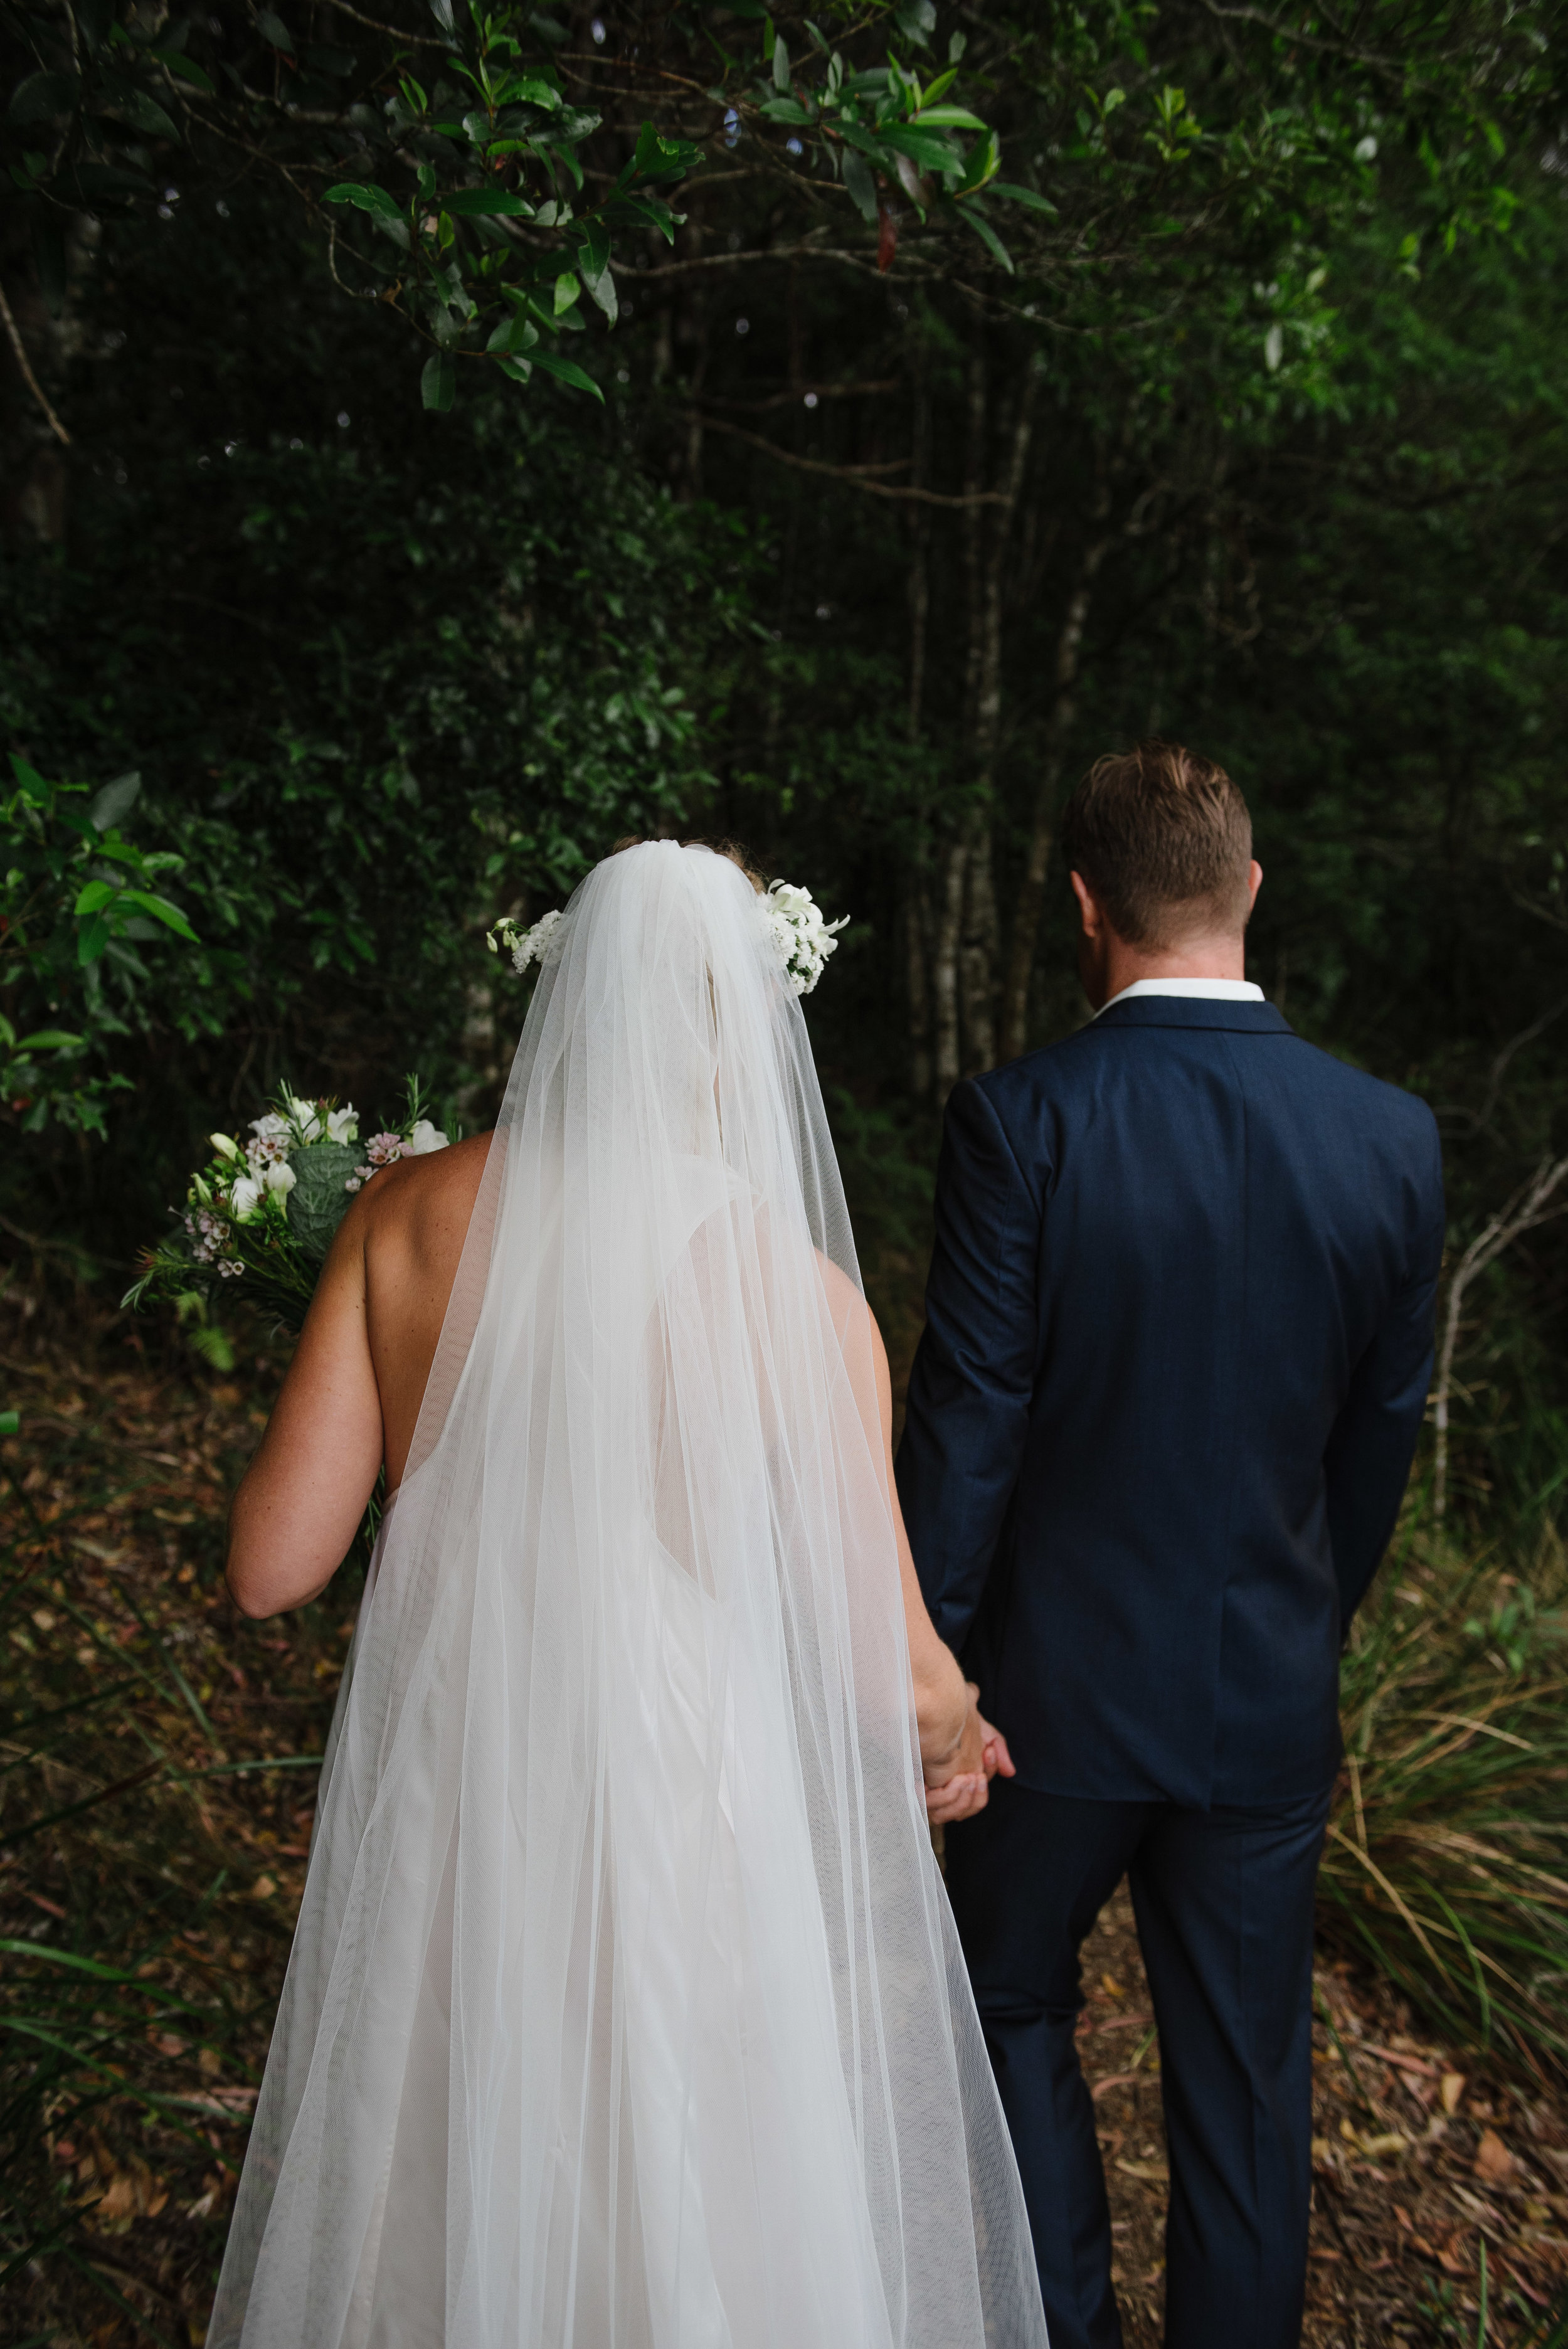 Carla and Luke- wedding photographer, byron bay wedding and family photographer, tweed heads wedding and family photography-208.jpg